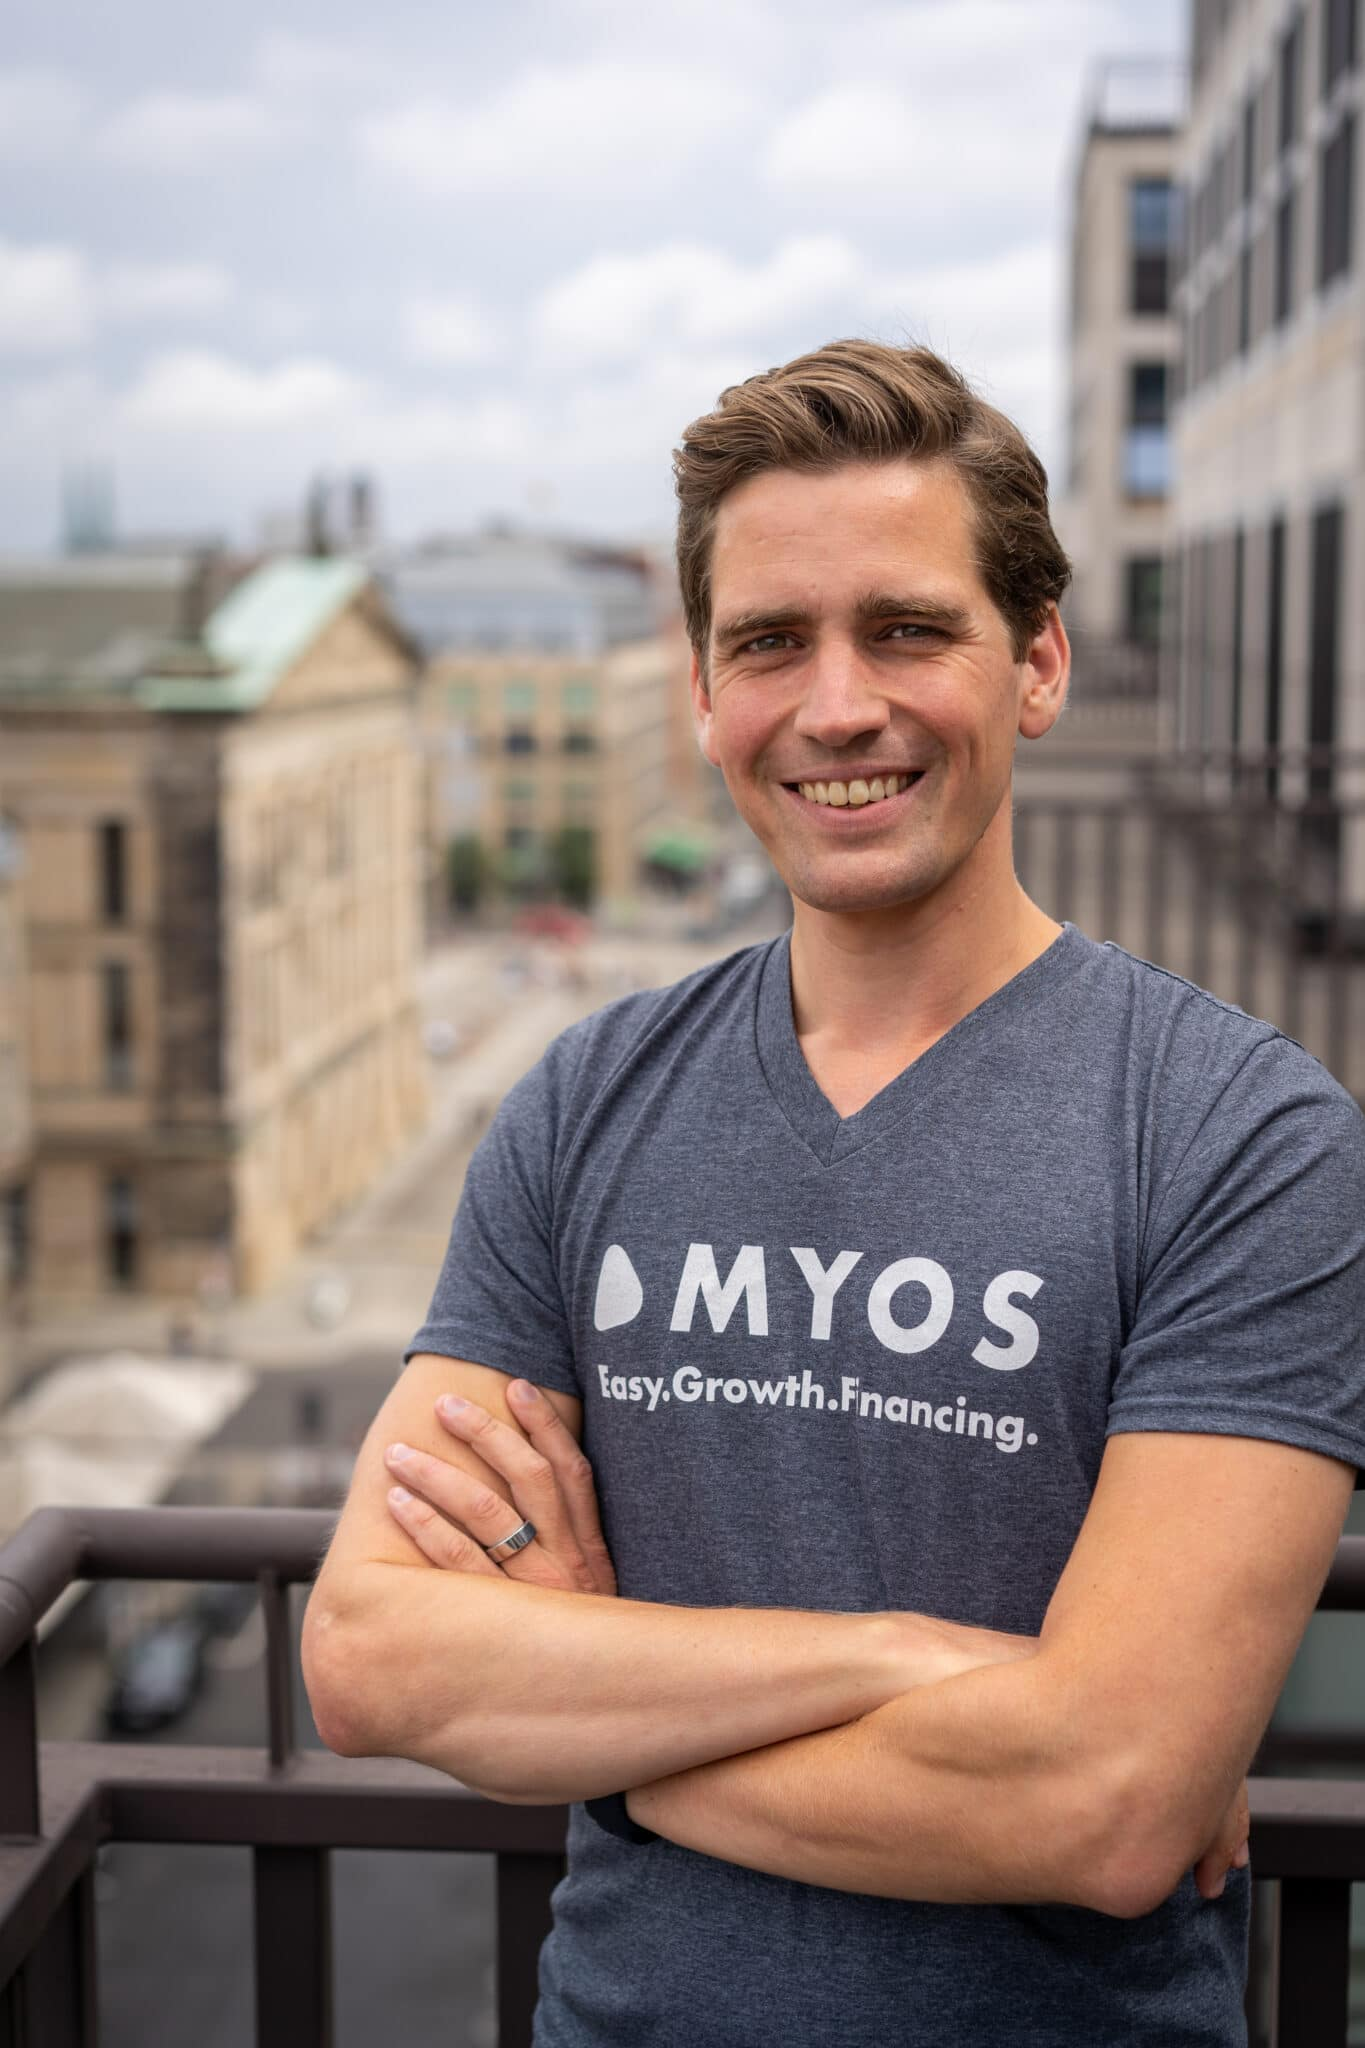 Nikolaus Hilgenfeldt Myos